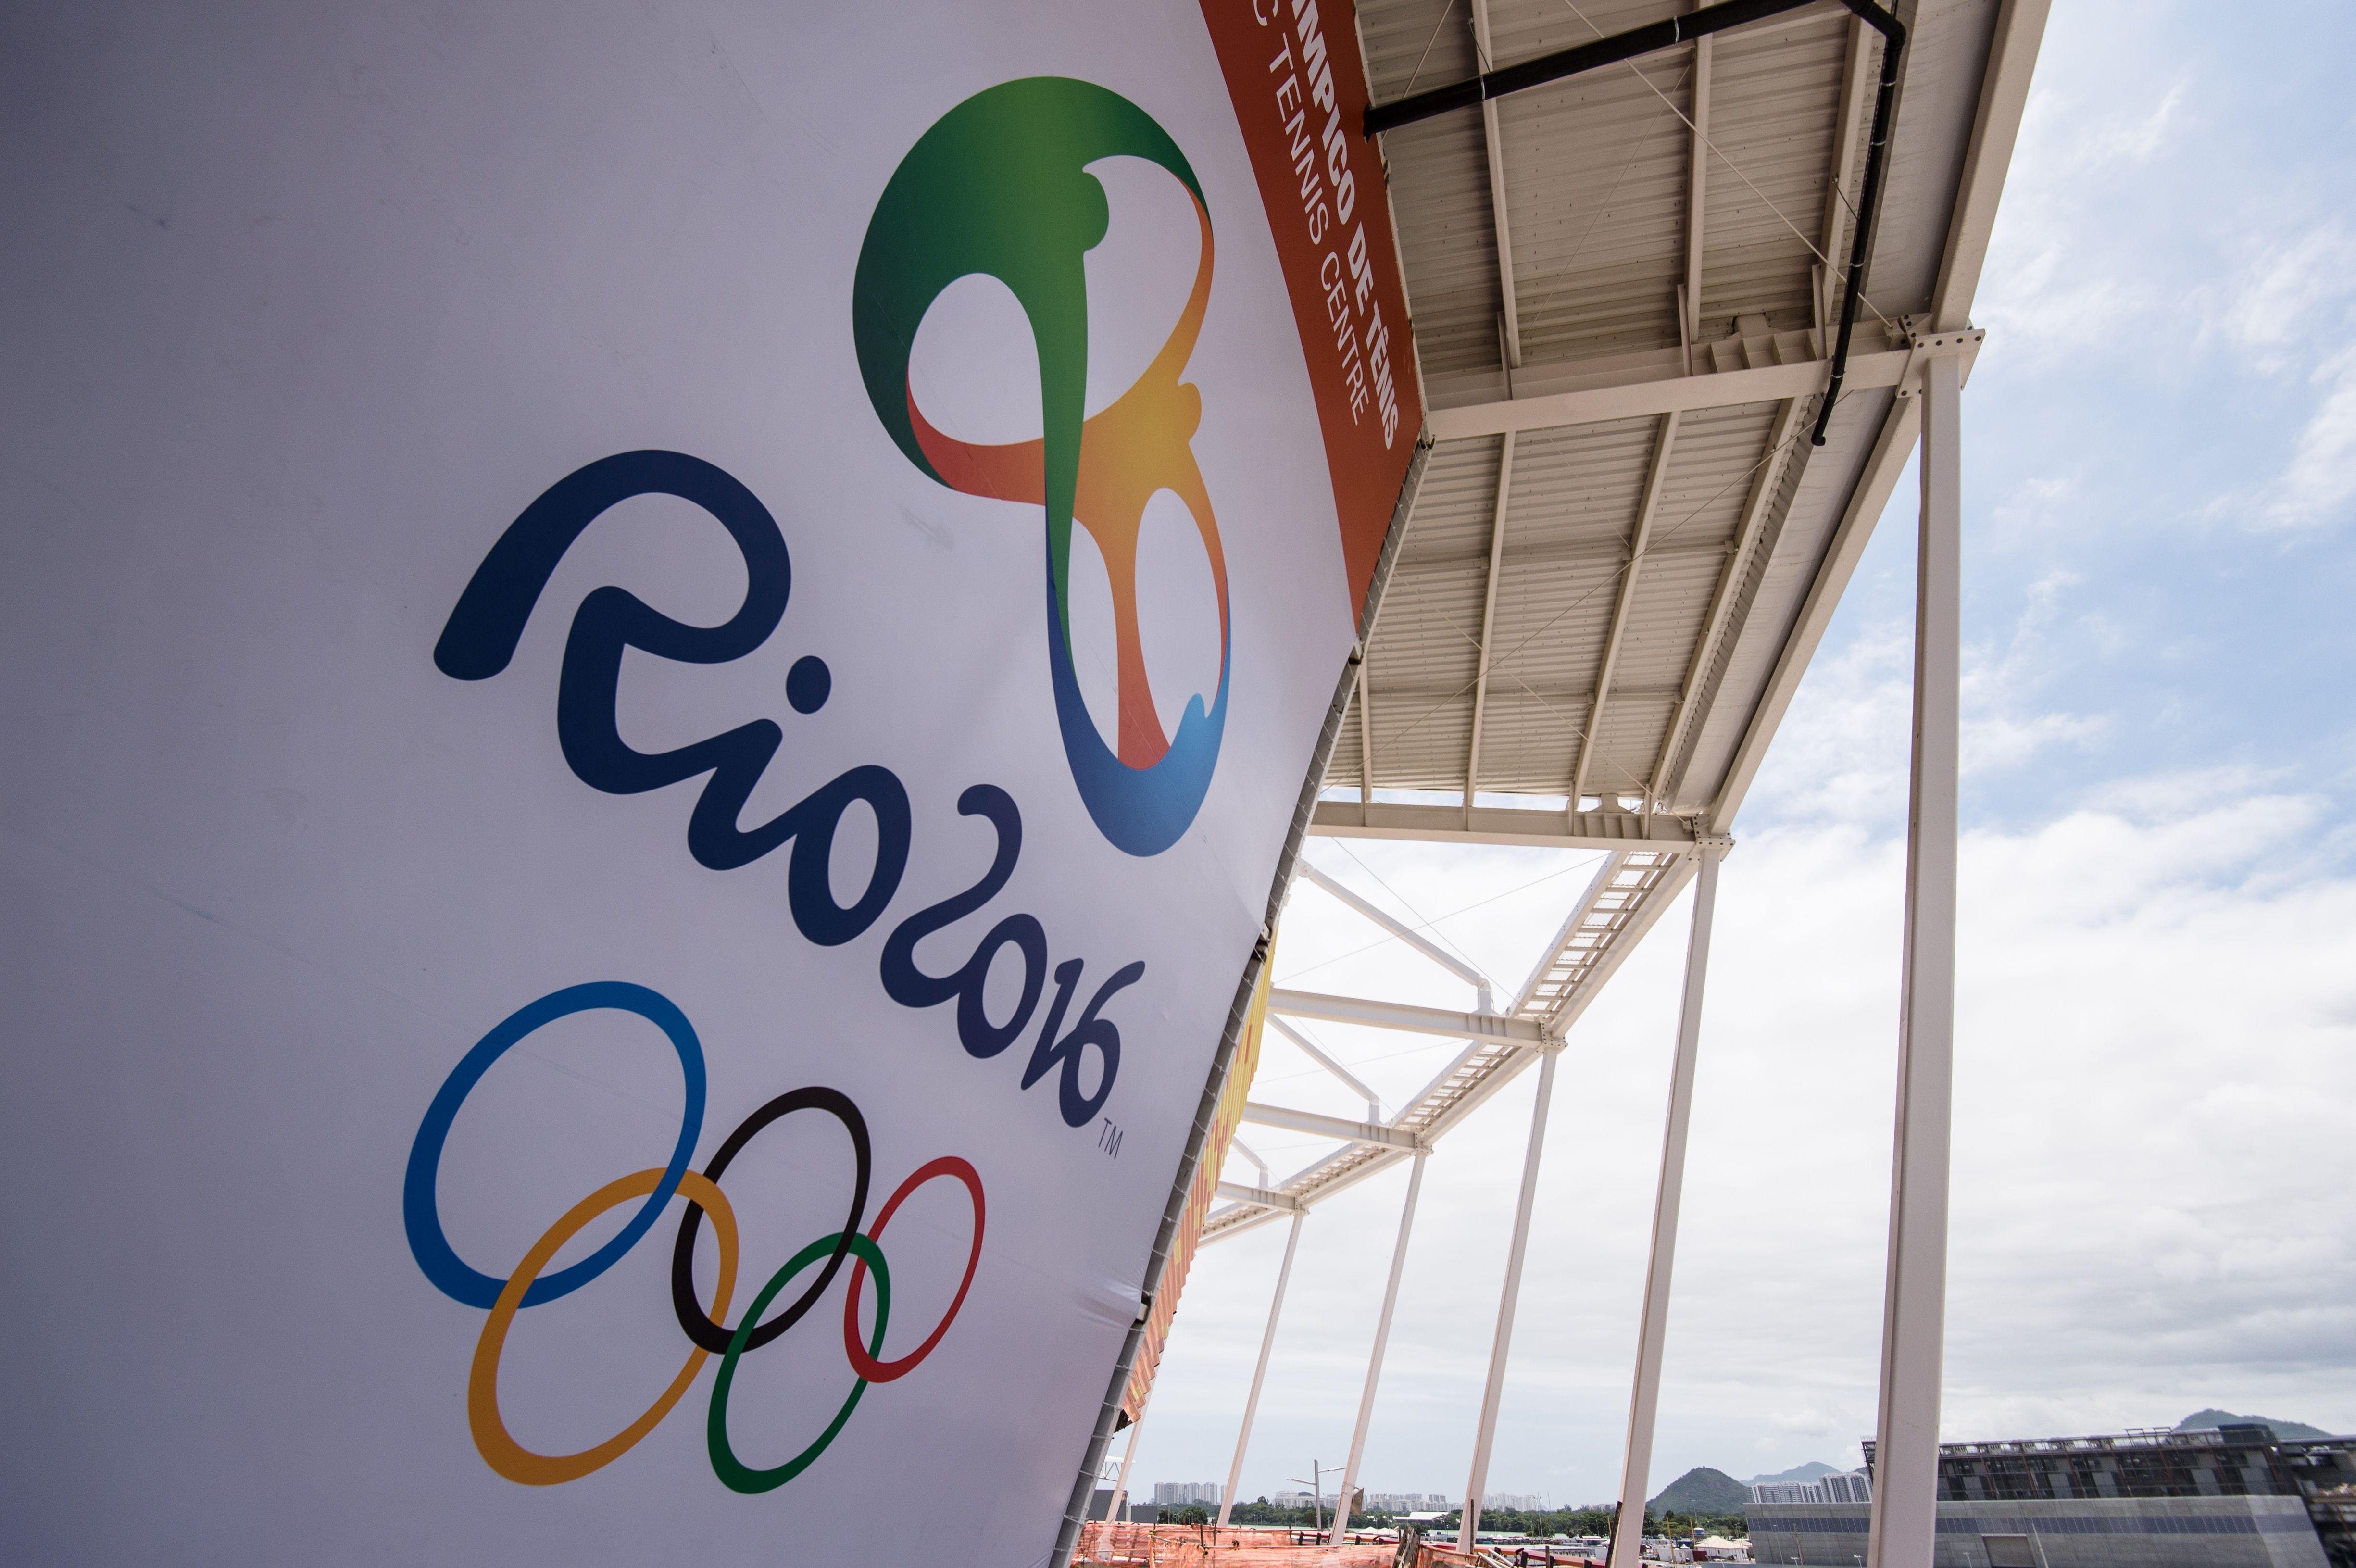 OLY-2016-RIO-TENNIS-OLYMPIC PARK-LOGO